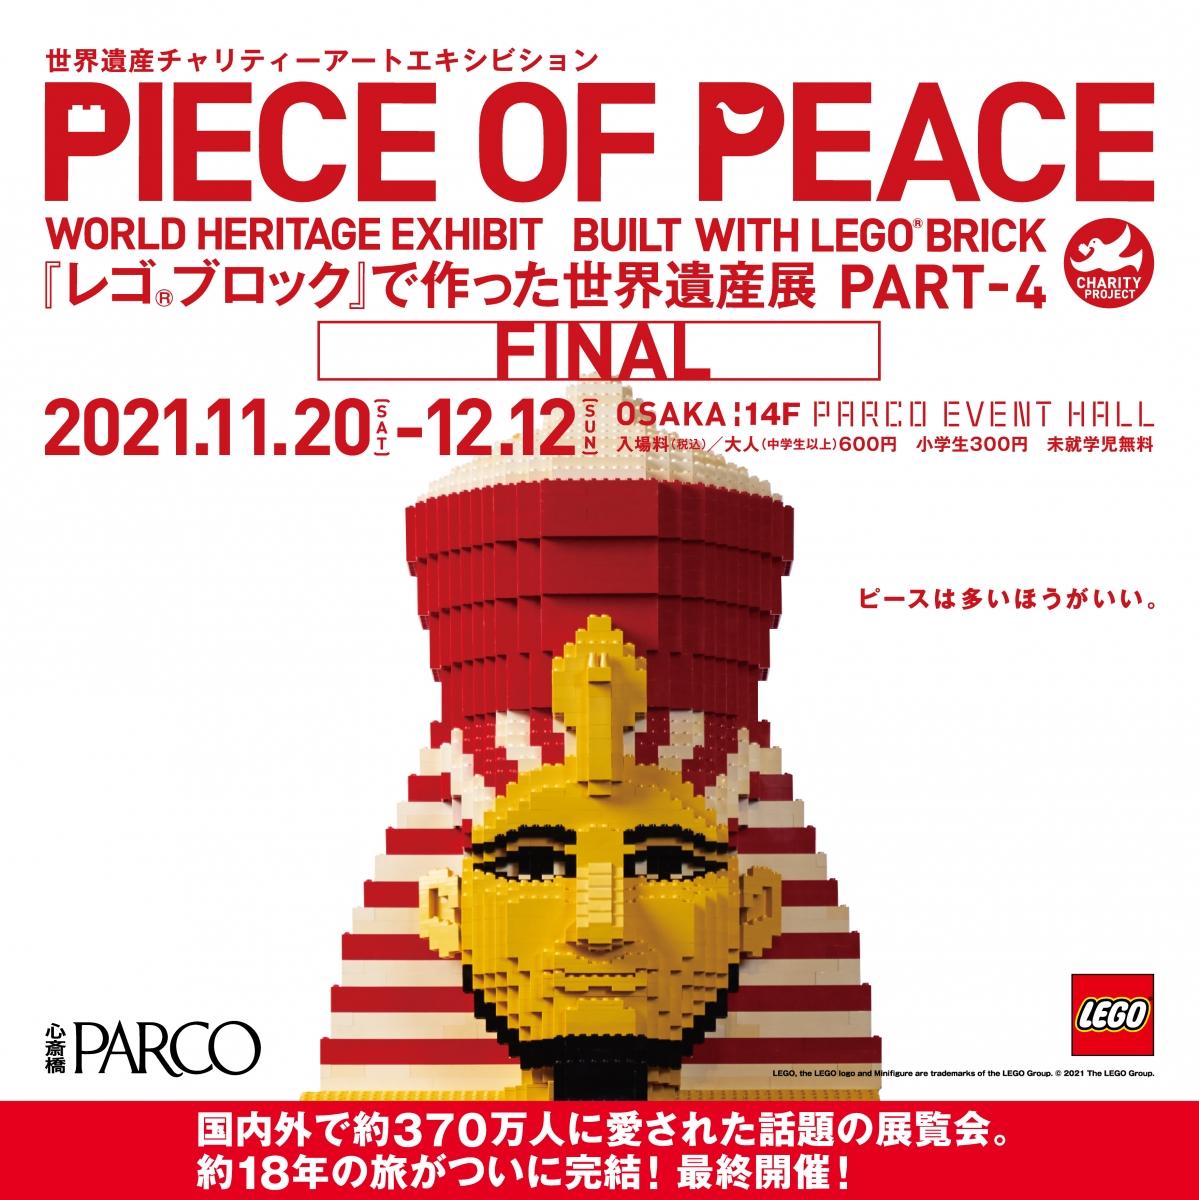 PIECE OF PEACE『レゴ®ブロック』で作った世界遺産展 PART-4 FINAL